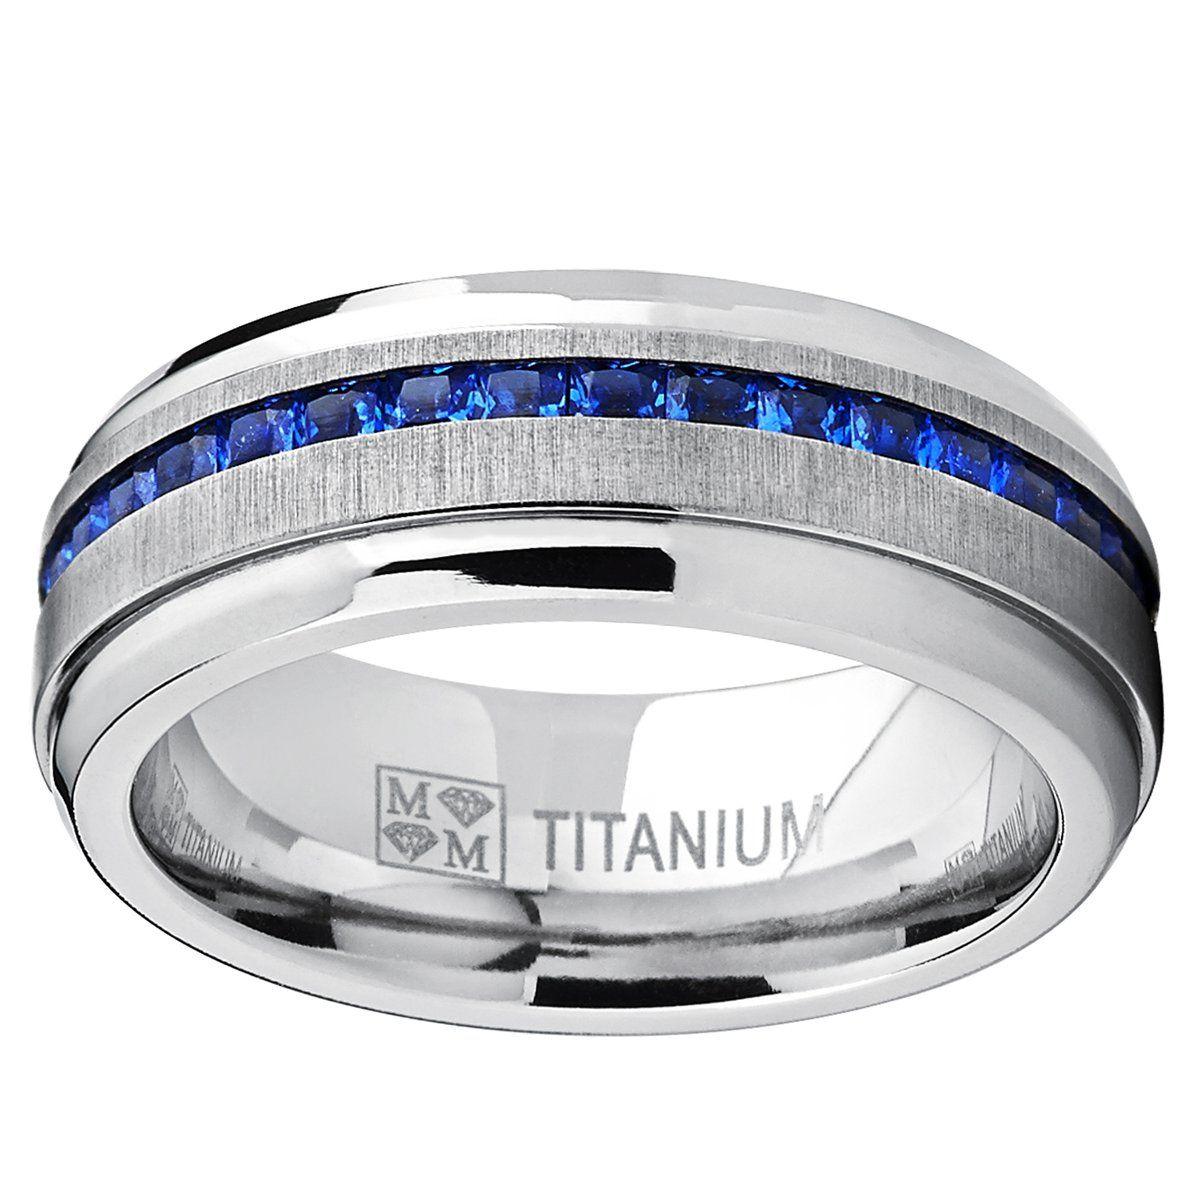 Men's Eternity Titanium Wedding Band Engagement Ring W